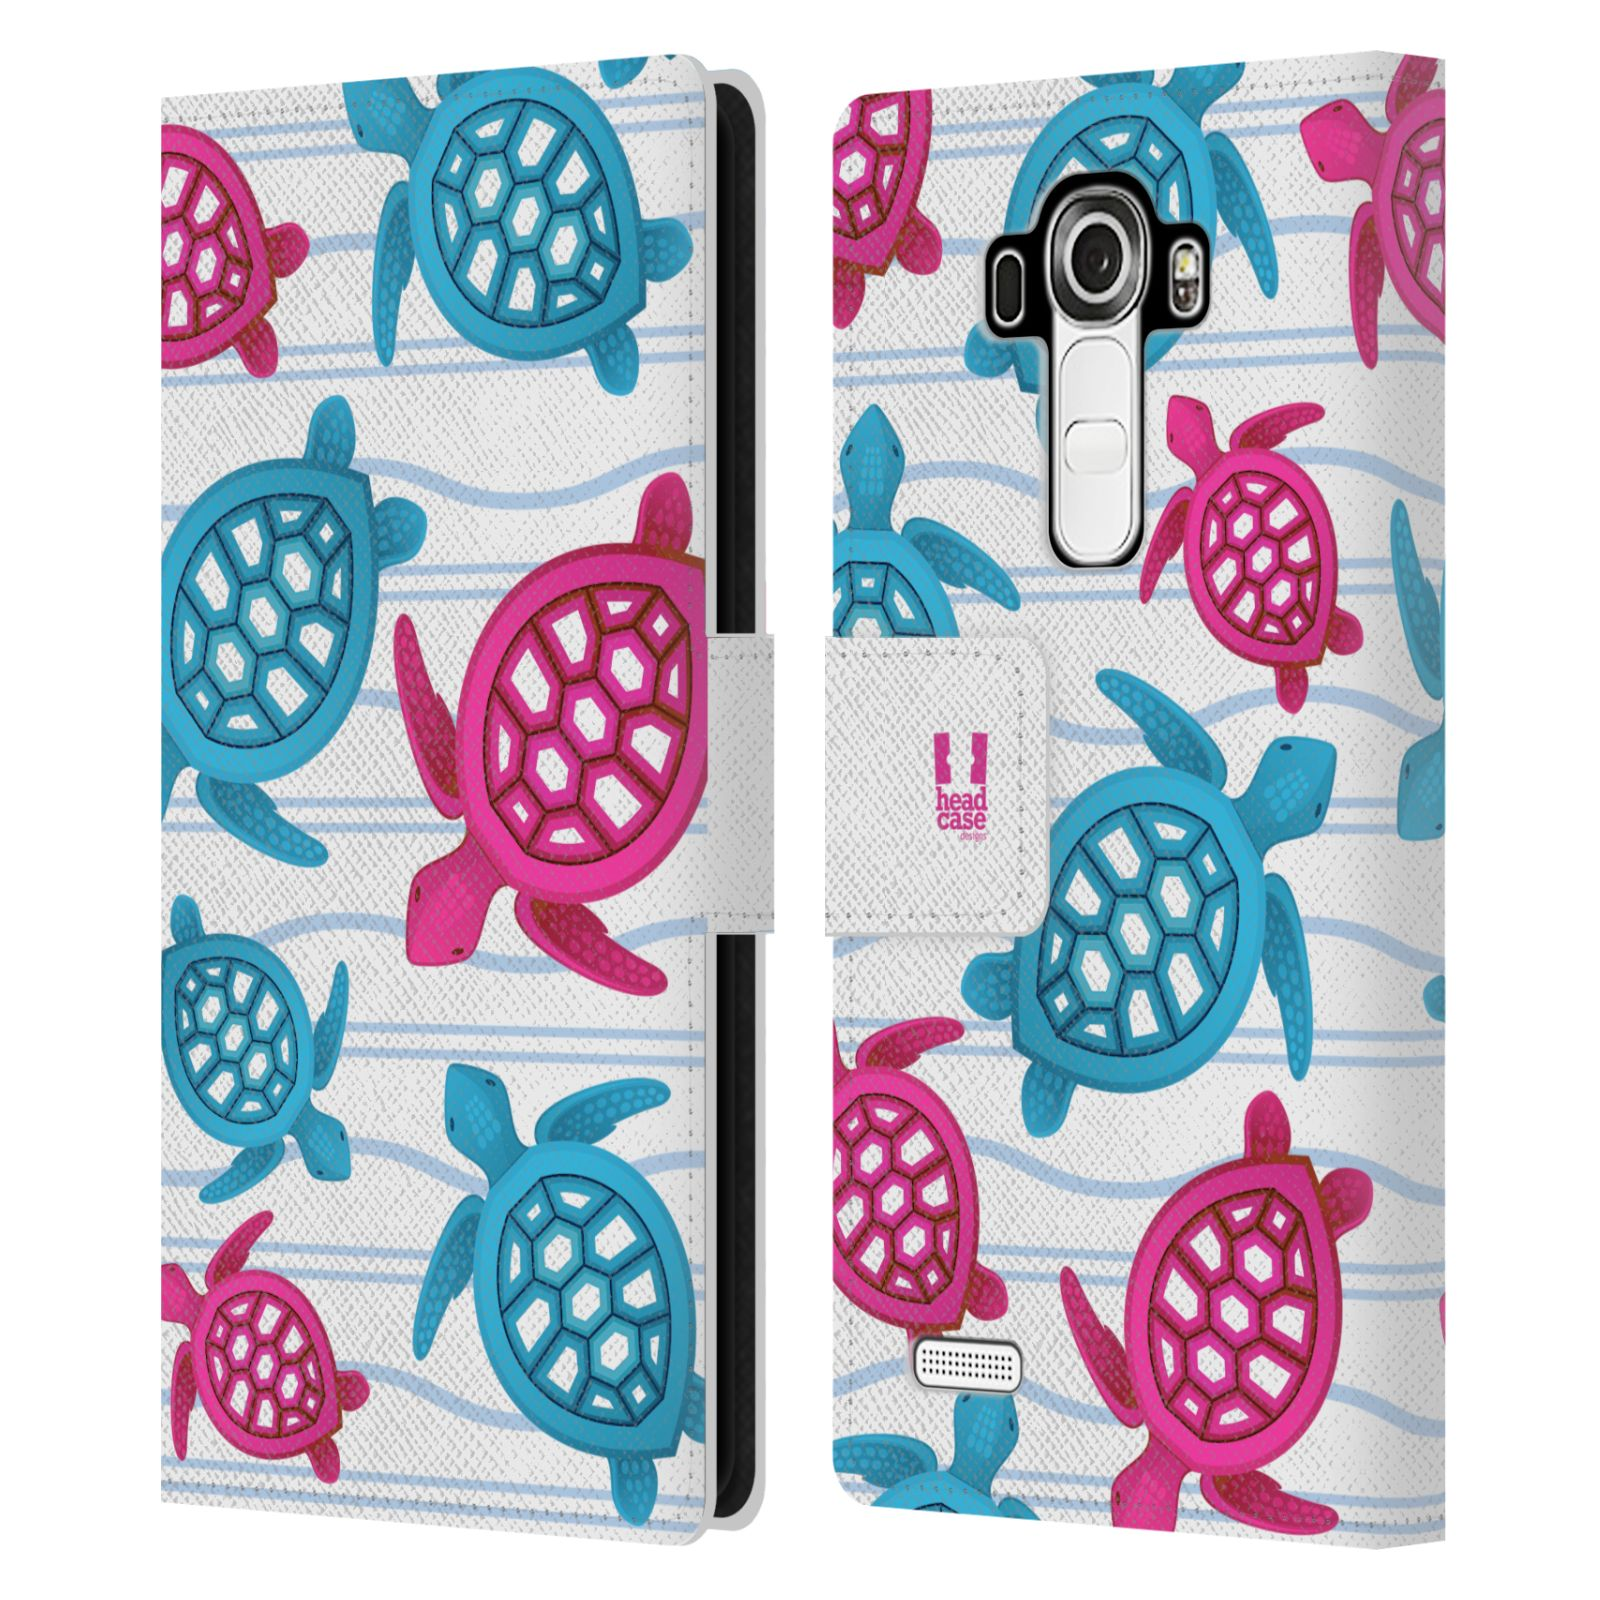 HEAD CASE Flipové pouzdro pro mobil LG G4 (H815) Mořský živočich malé želvičky